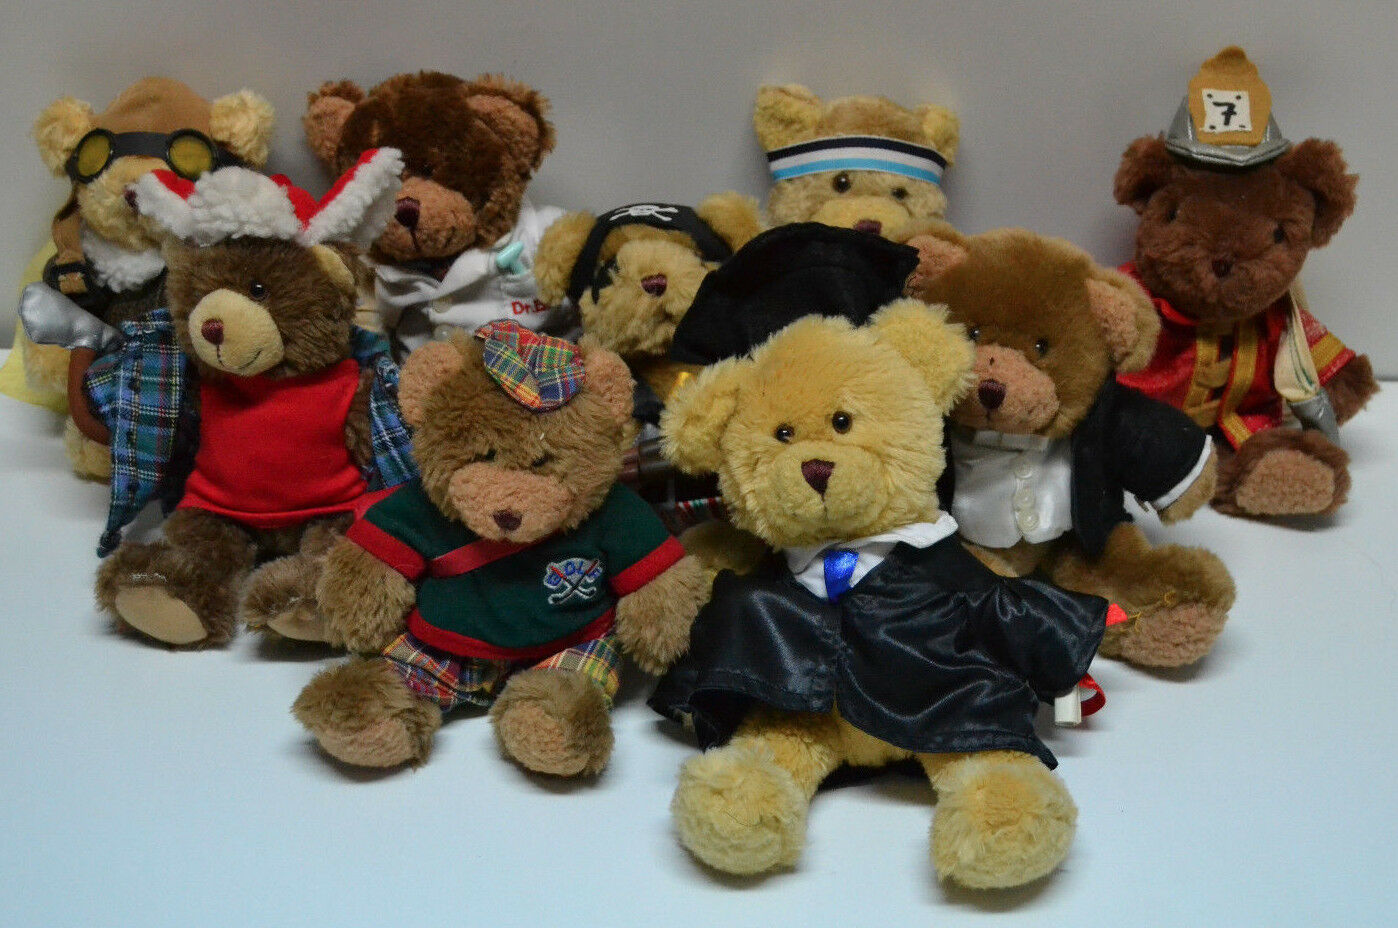 Lote de 9 muñecos de peluche THE THE THE TEDDY BEAR COLLECTION db1